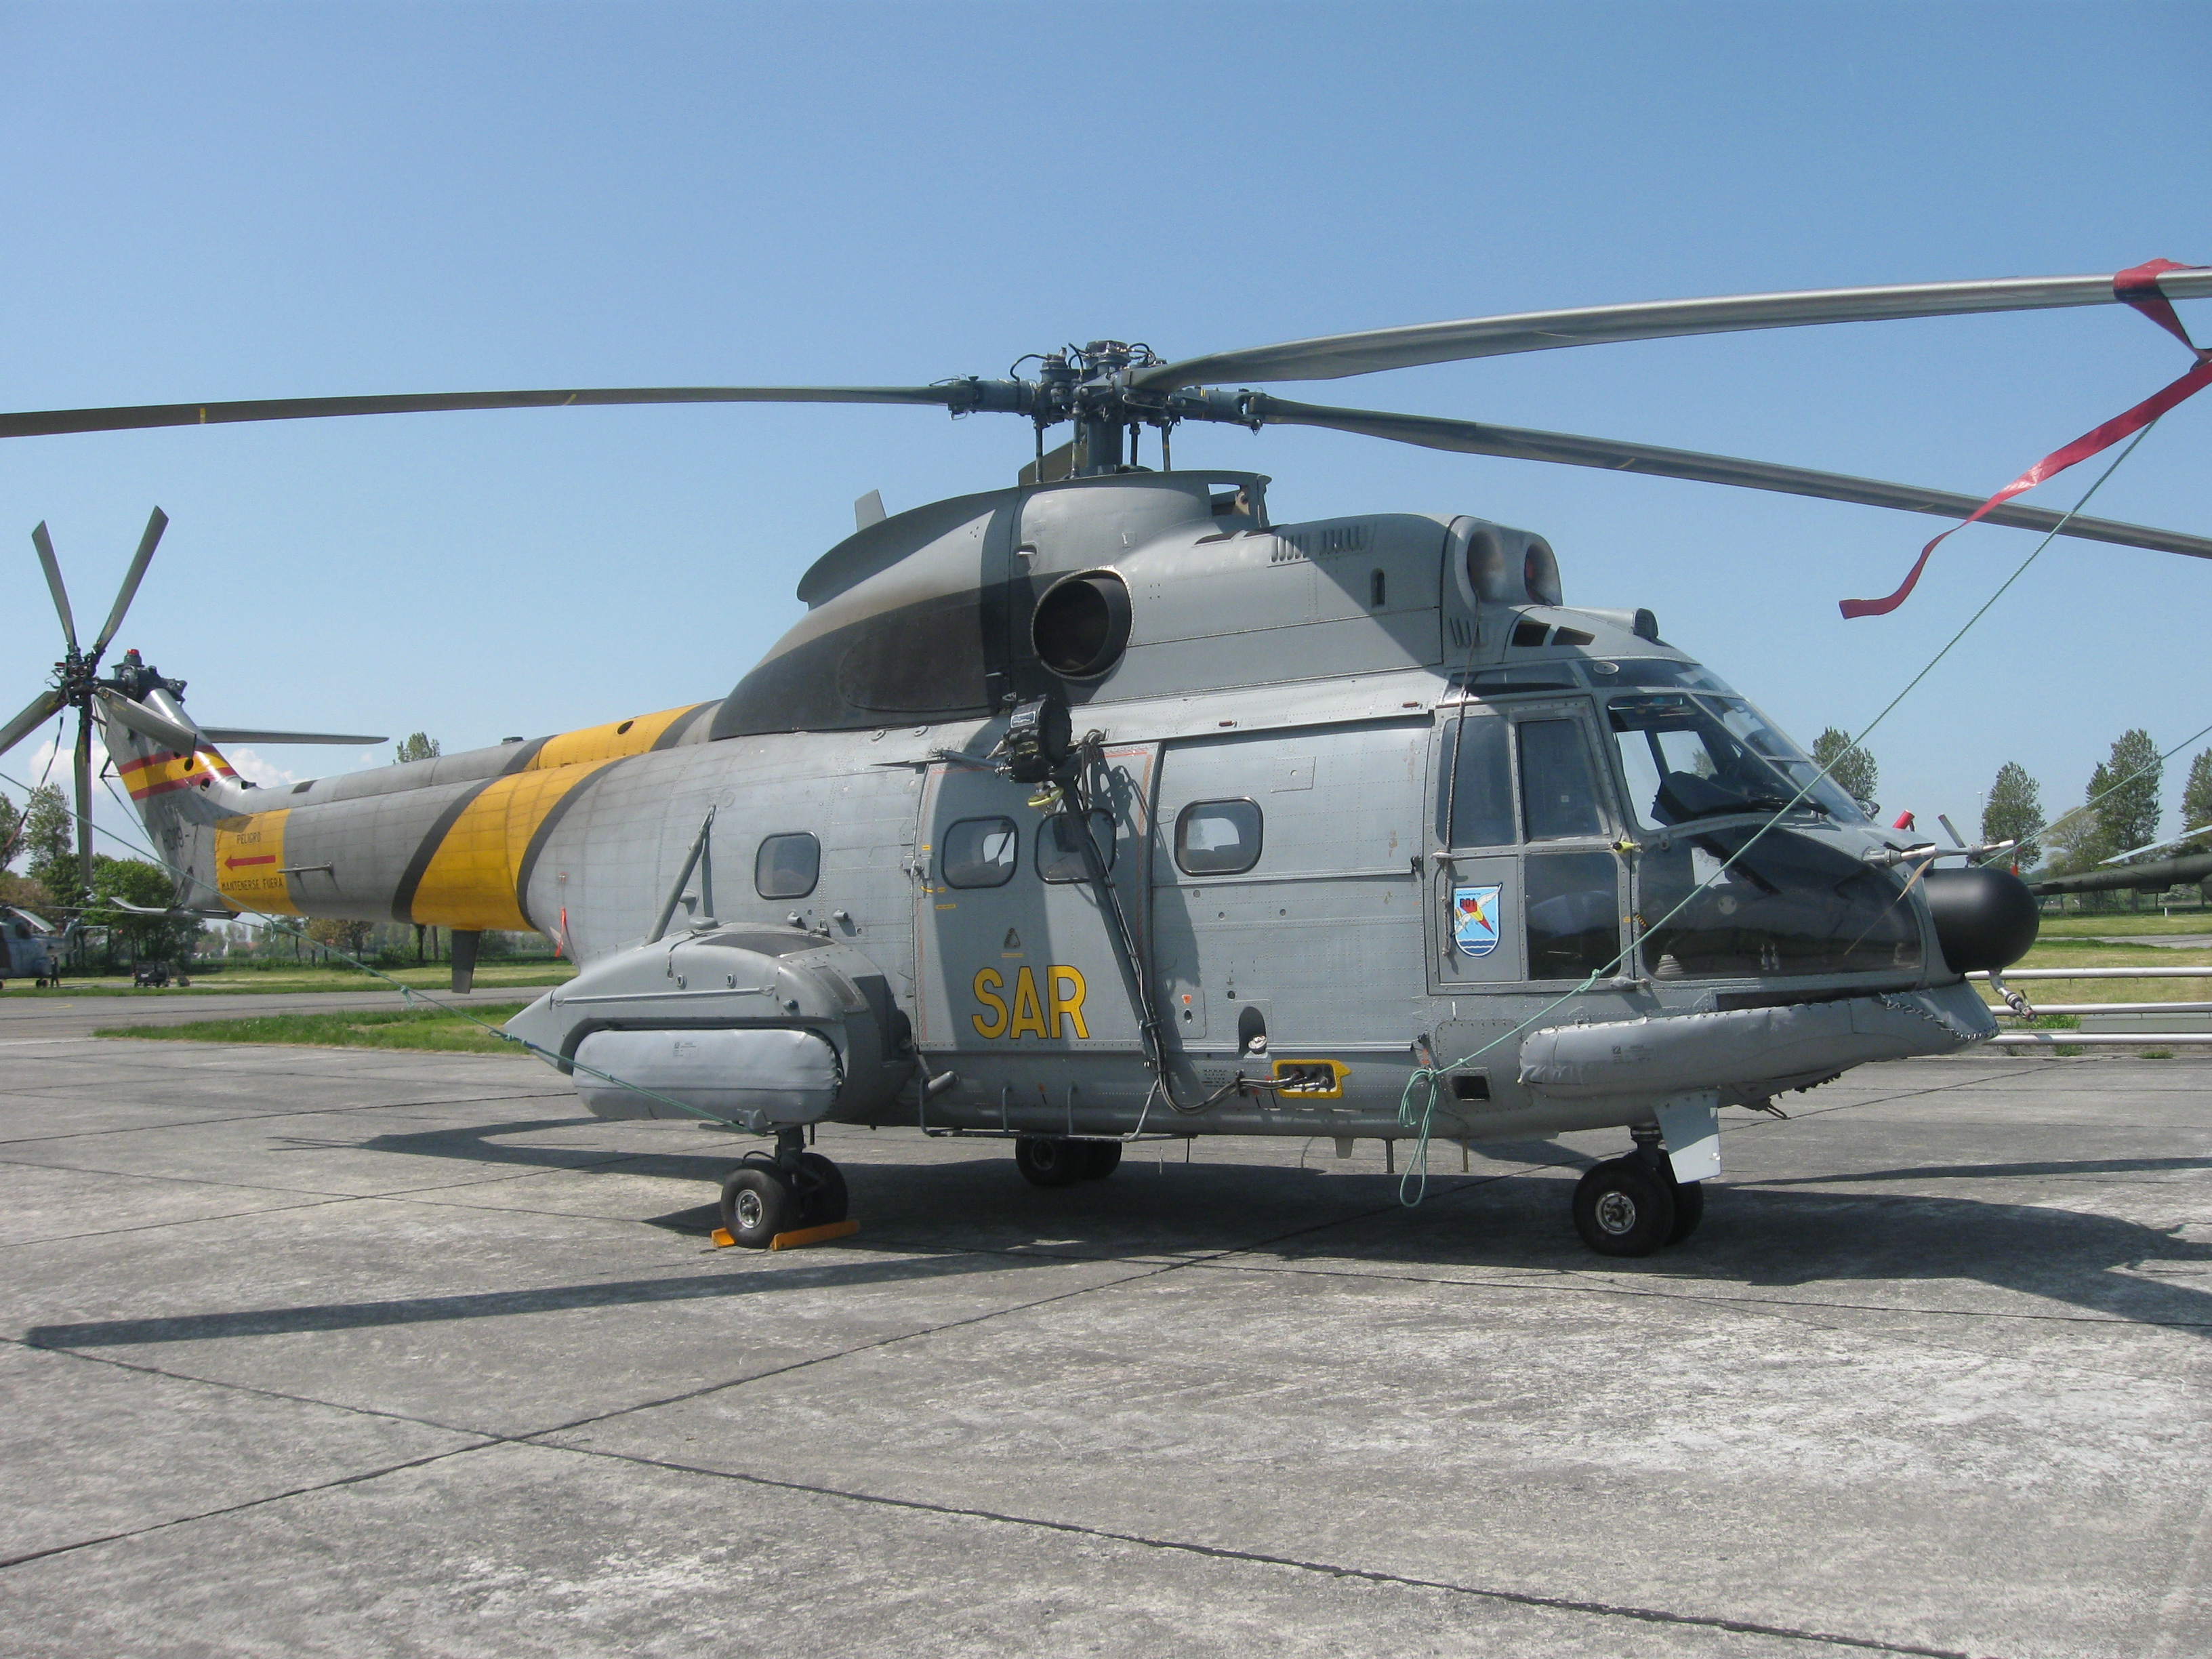 Helico's : divers, photos, infos 1005180812021050246058956